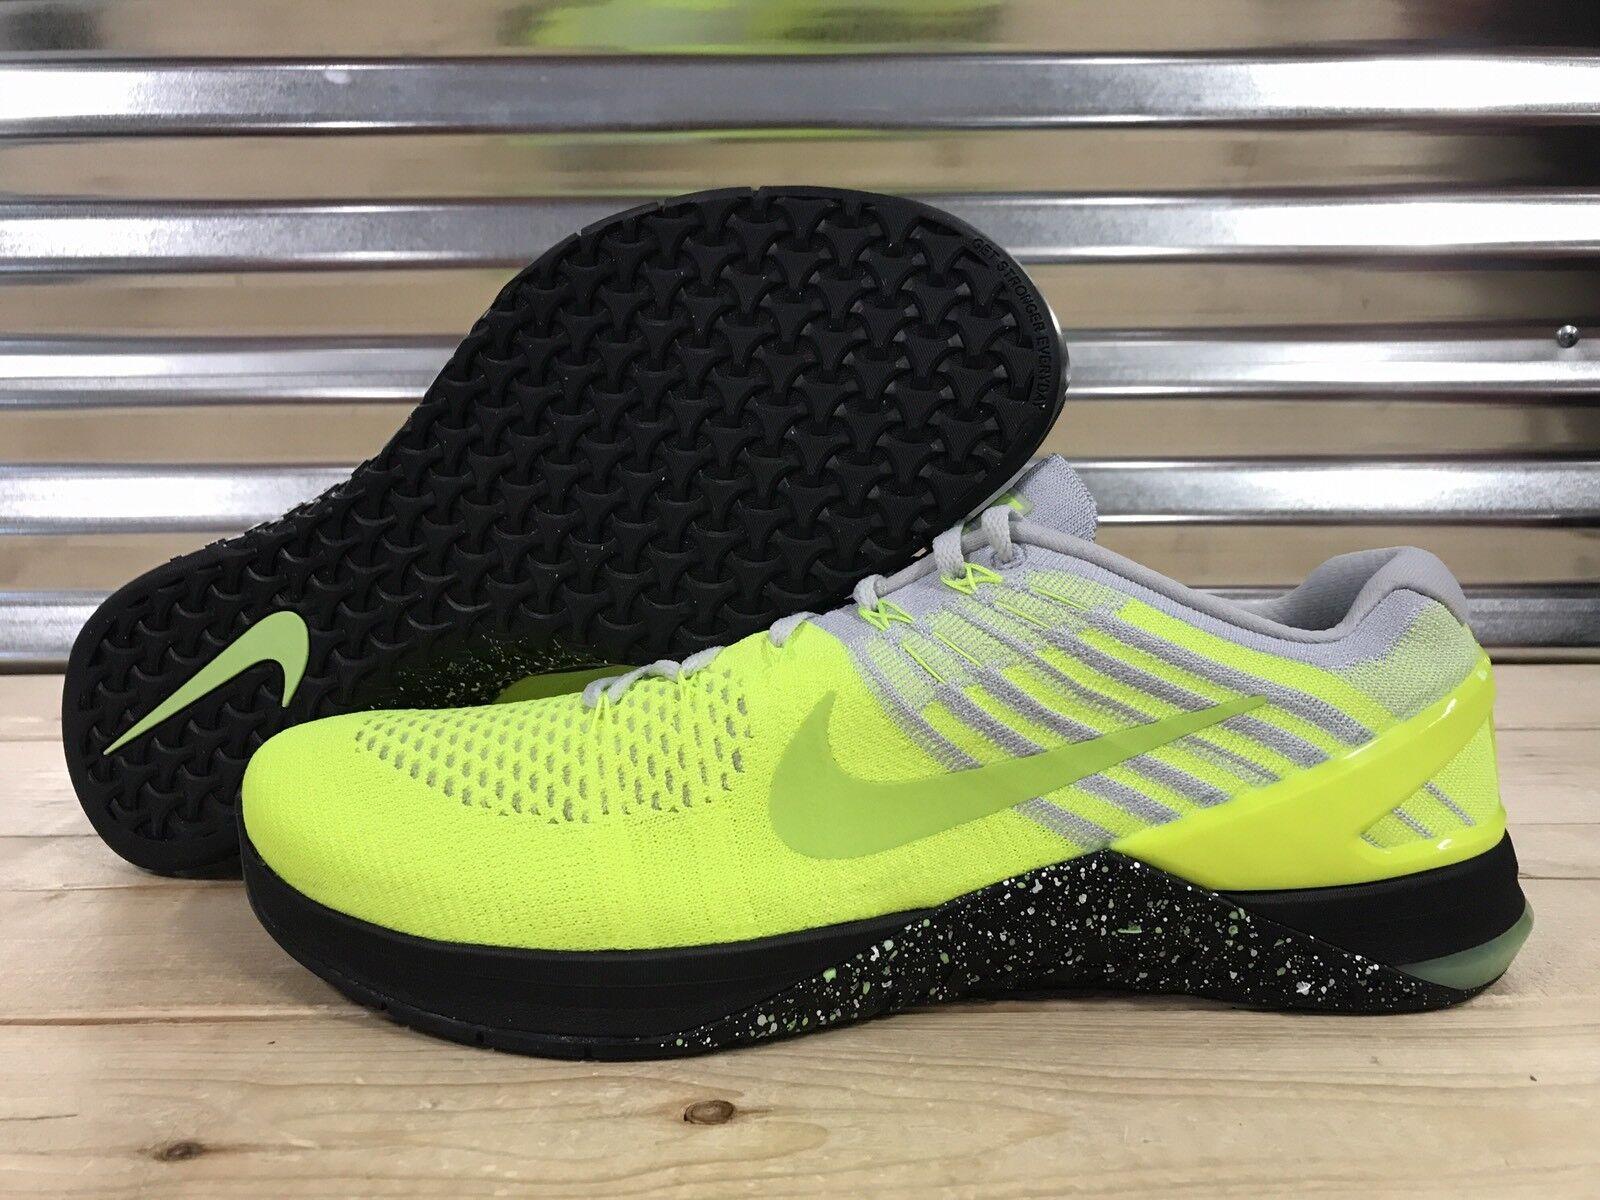 Nike Metcon DSX Flyknit Trainer Shoes Volt Black White SZ 12 ( 852930-701 )